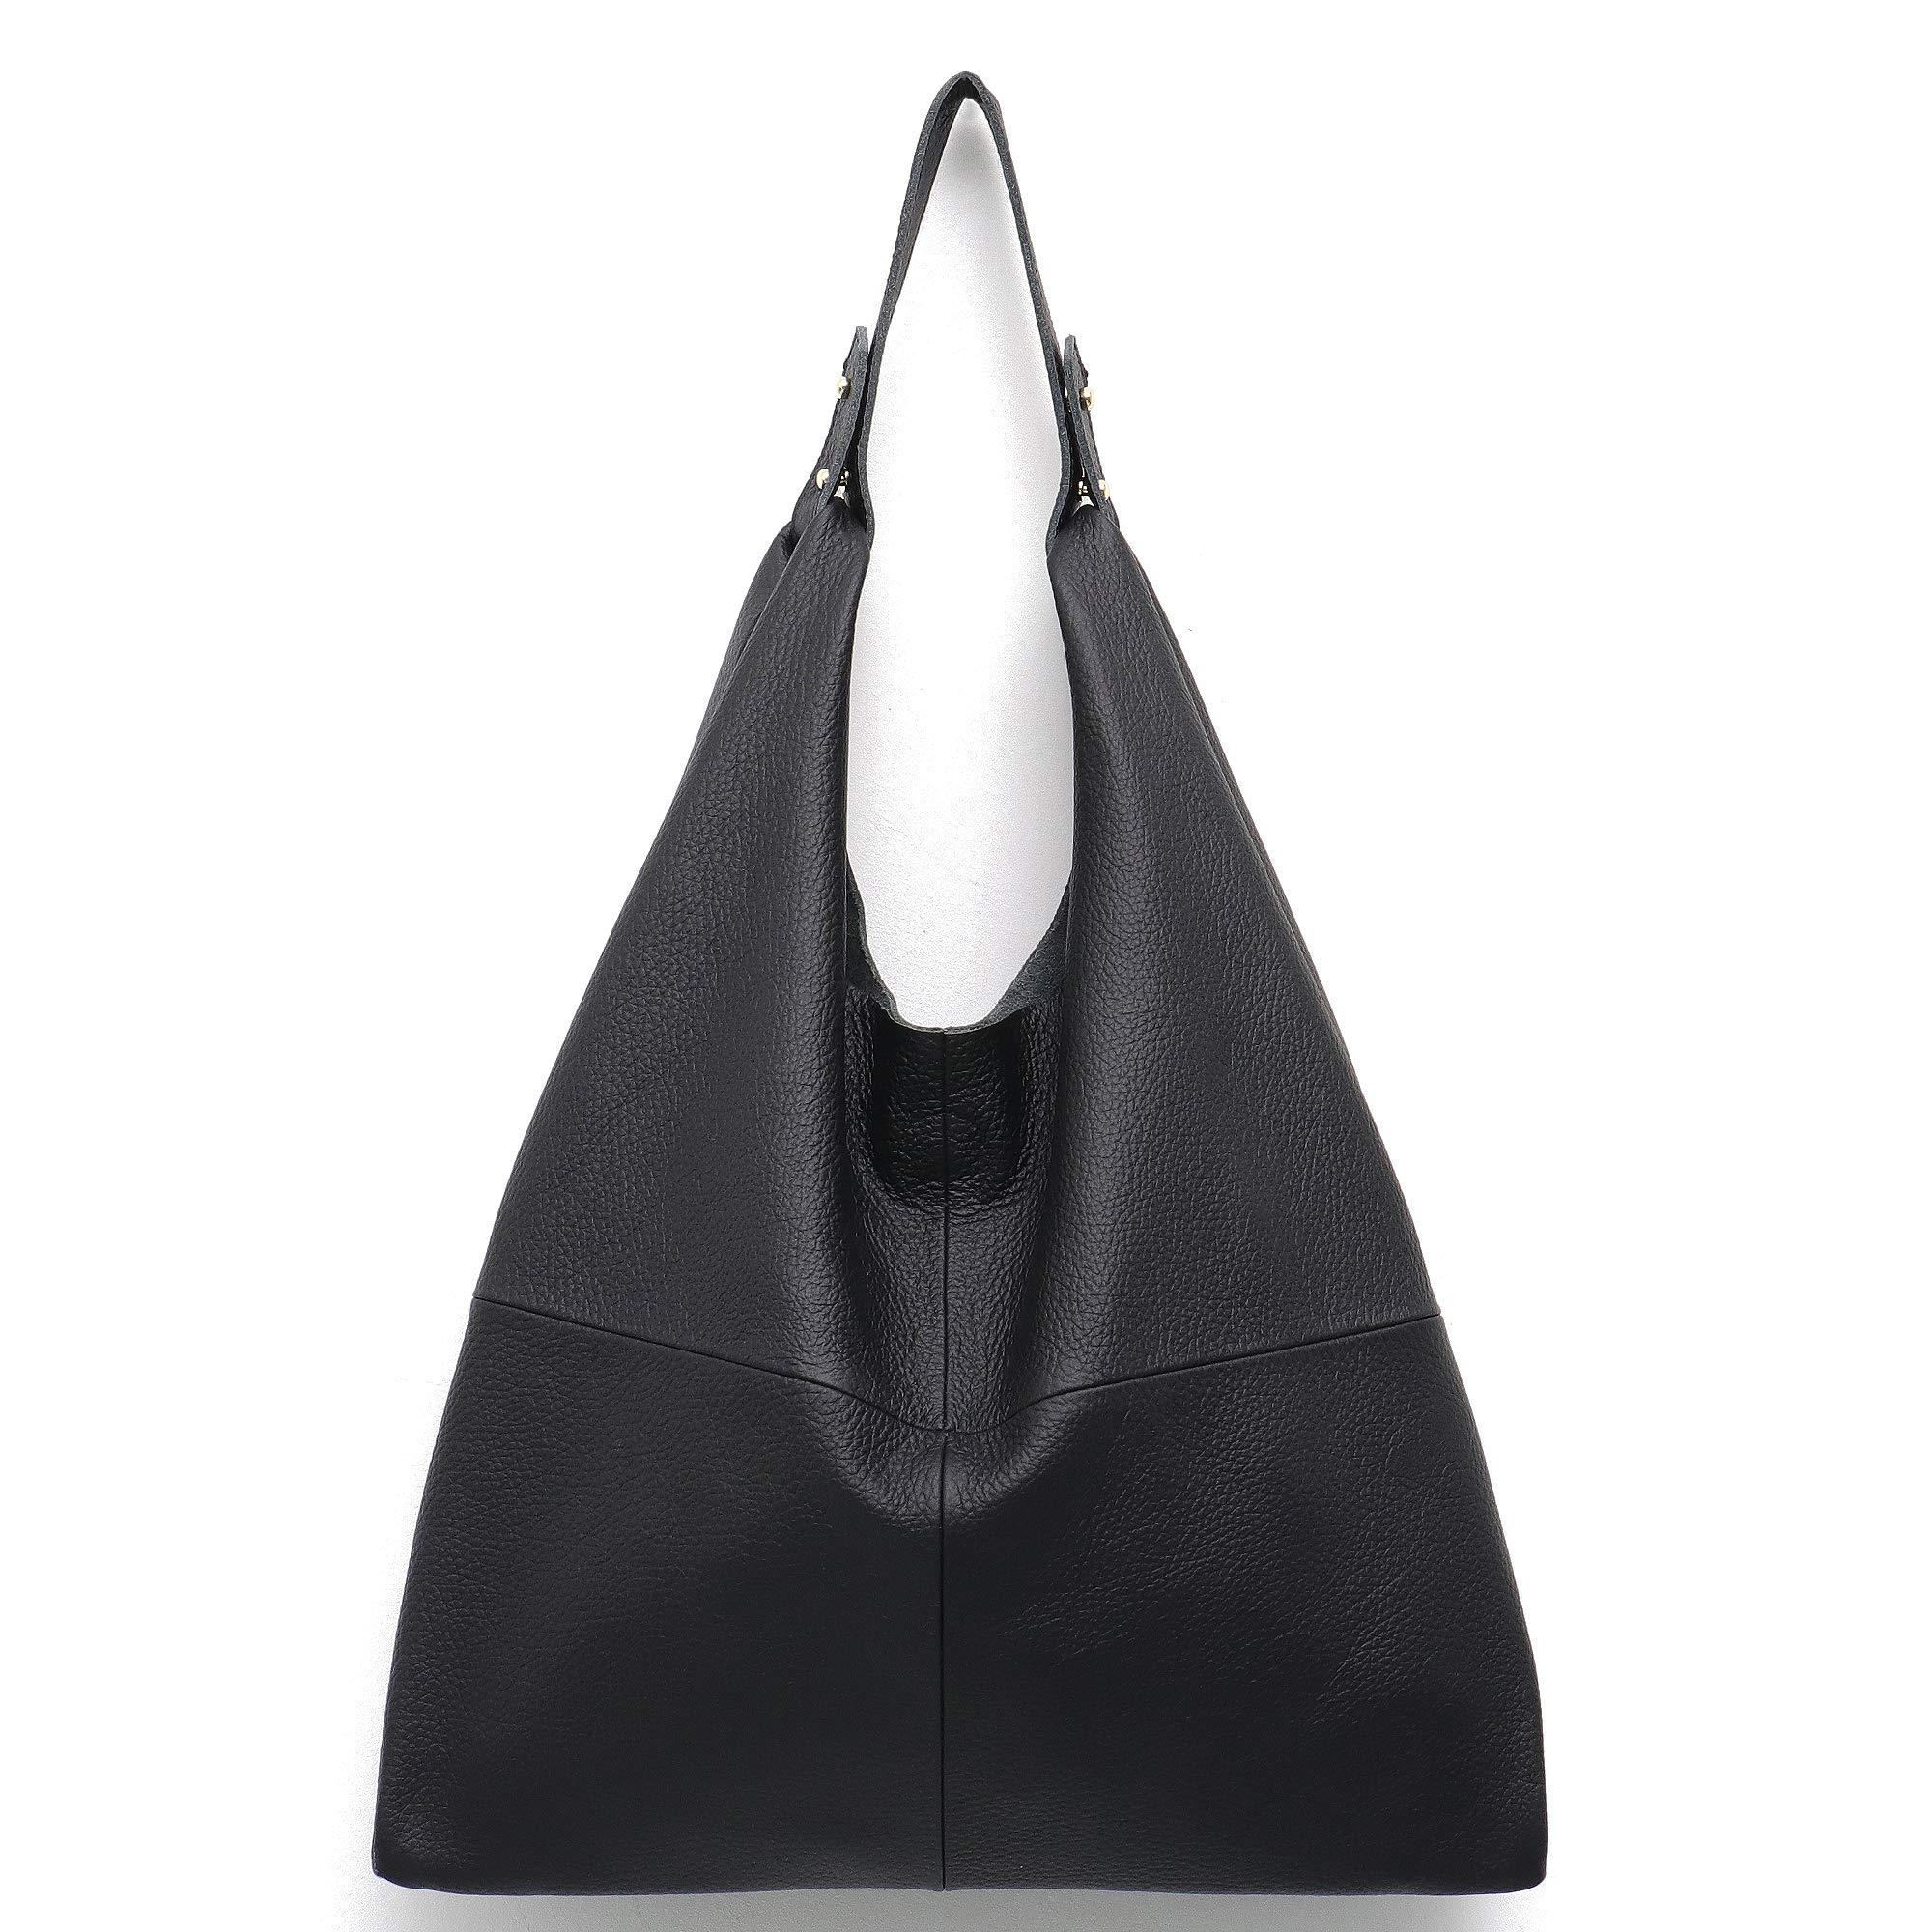 STEPHIECATH Women's Handbag Genuine Leather Slouchy Hobo Shoulder Bag Large Casual Soft Handmade Tote Bags Ladies Vintage Bucket Snap Shopping Bag with Zipper Cellphone Liner Bag Inside (Black)